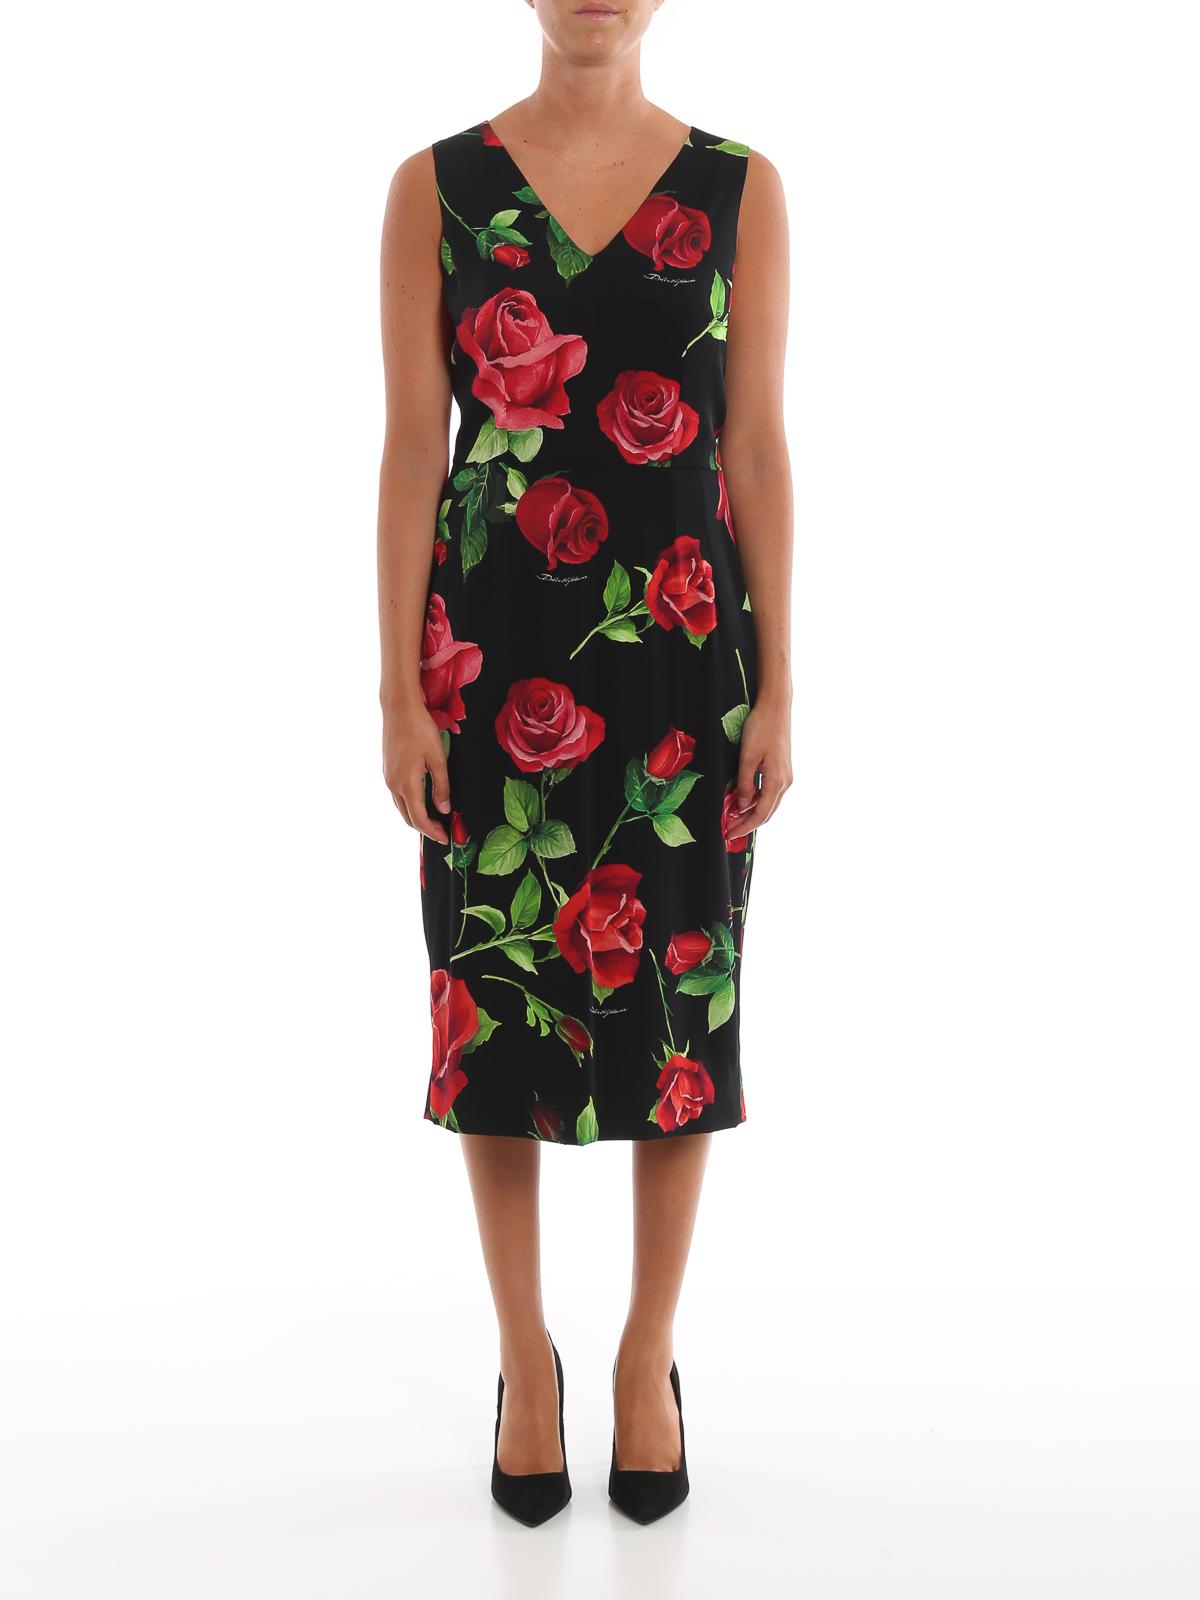 new style 4ad1c 9115b Dolce & Gabbana - Tubino smanicato in seta stampa rose ...